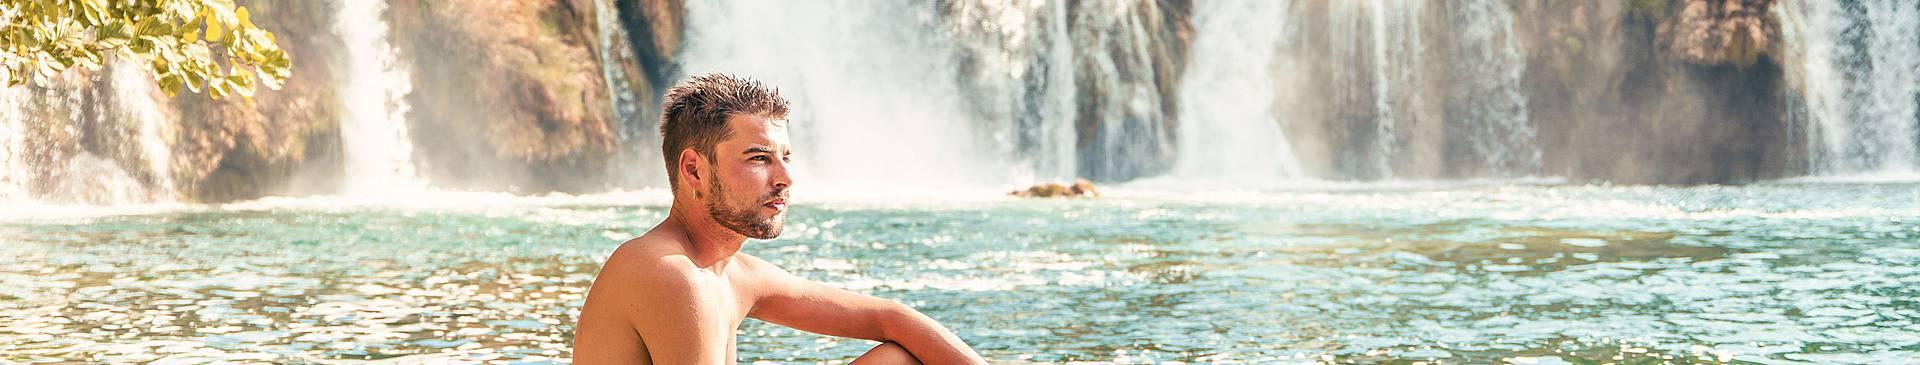 Wellness retreats in Croatia